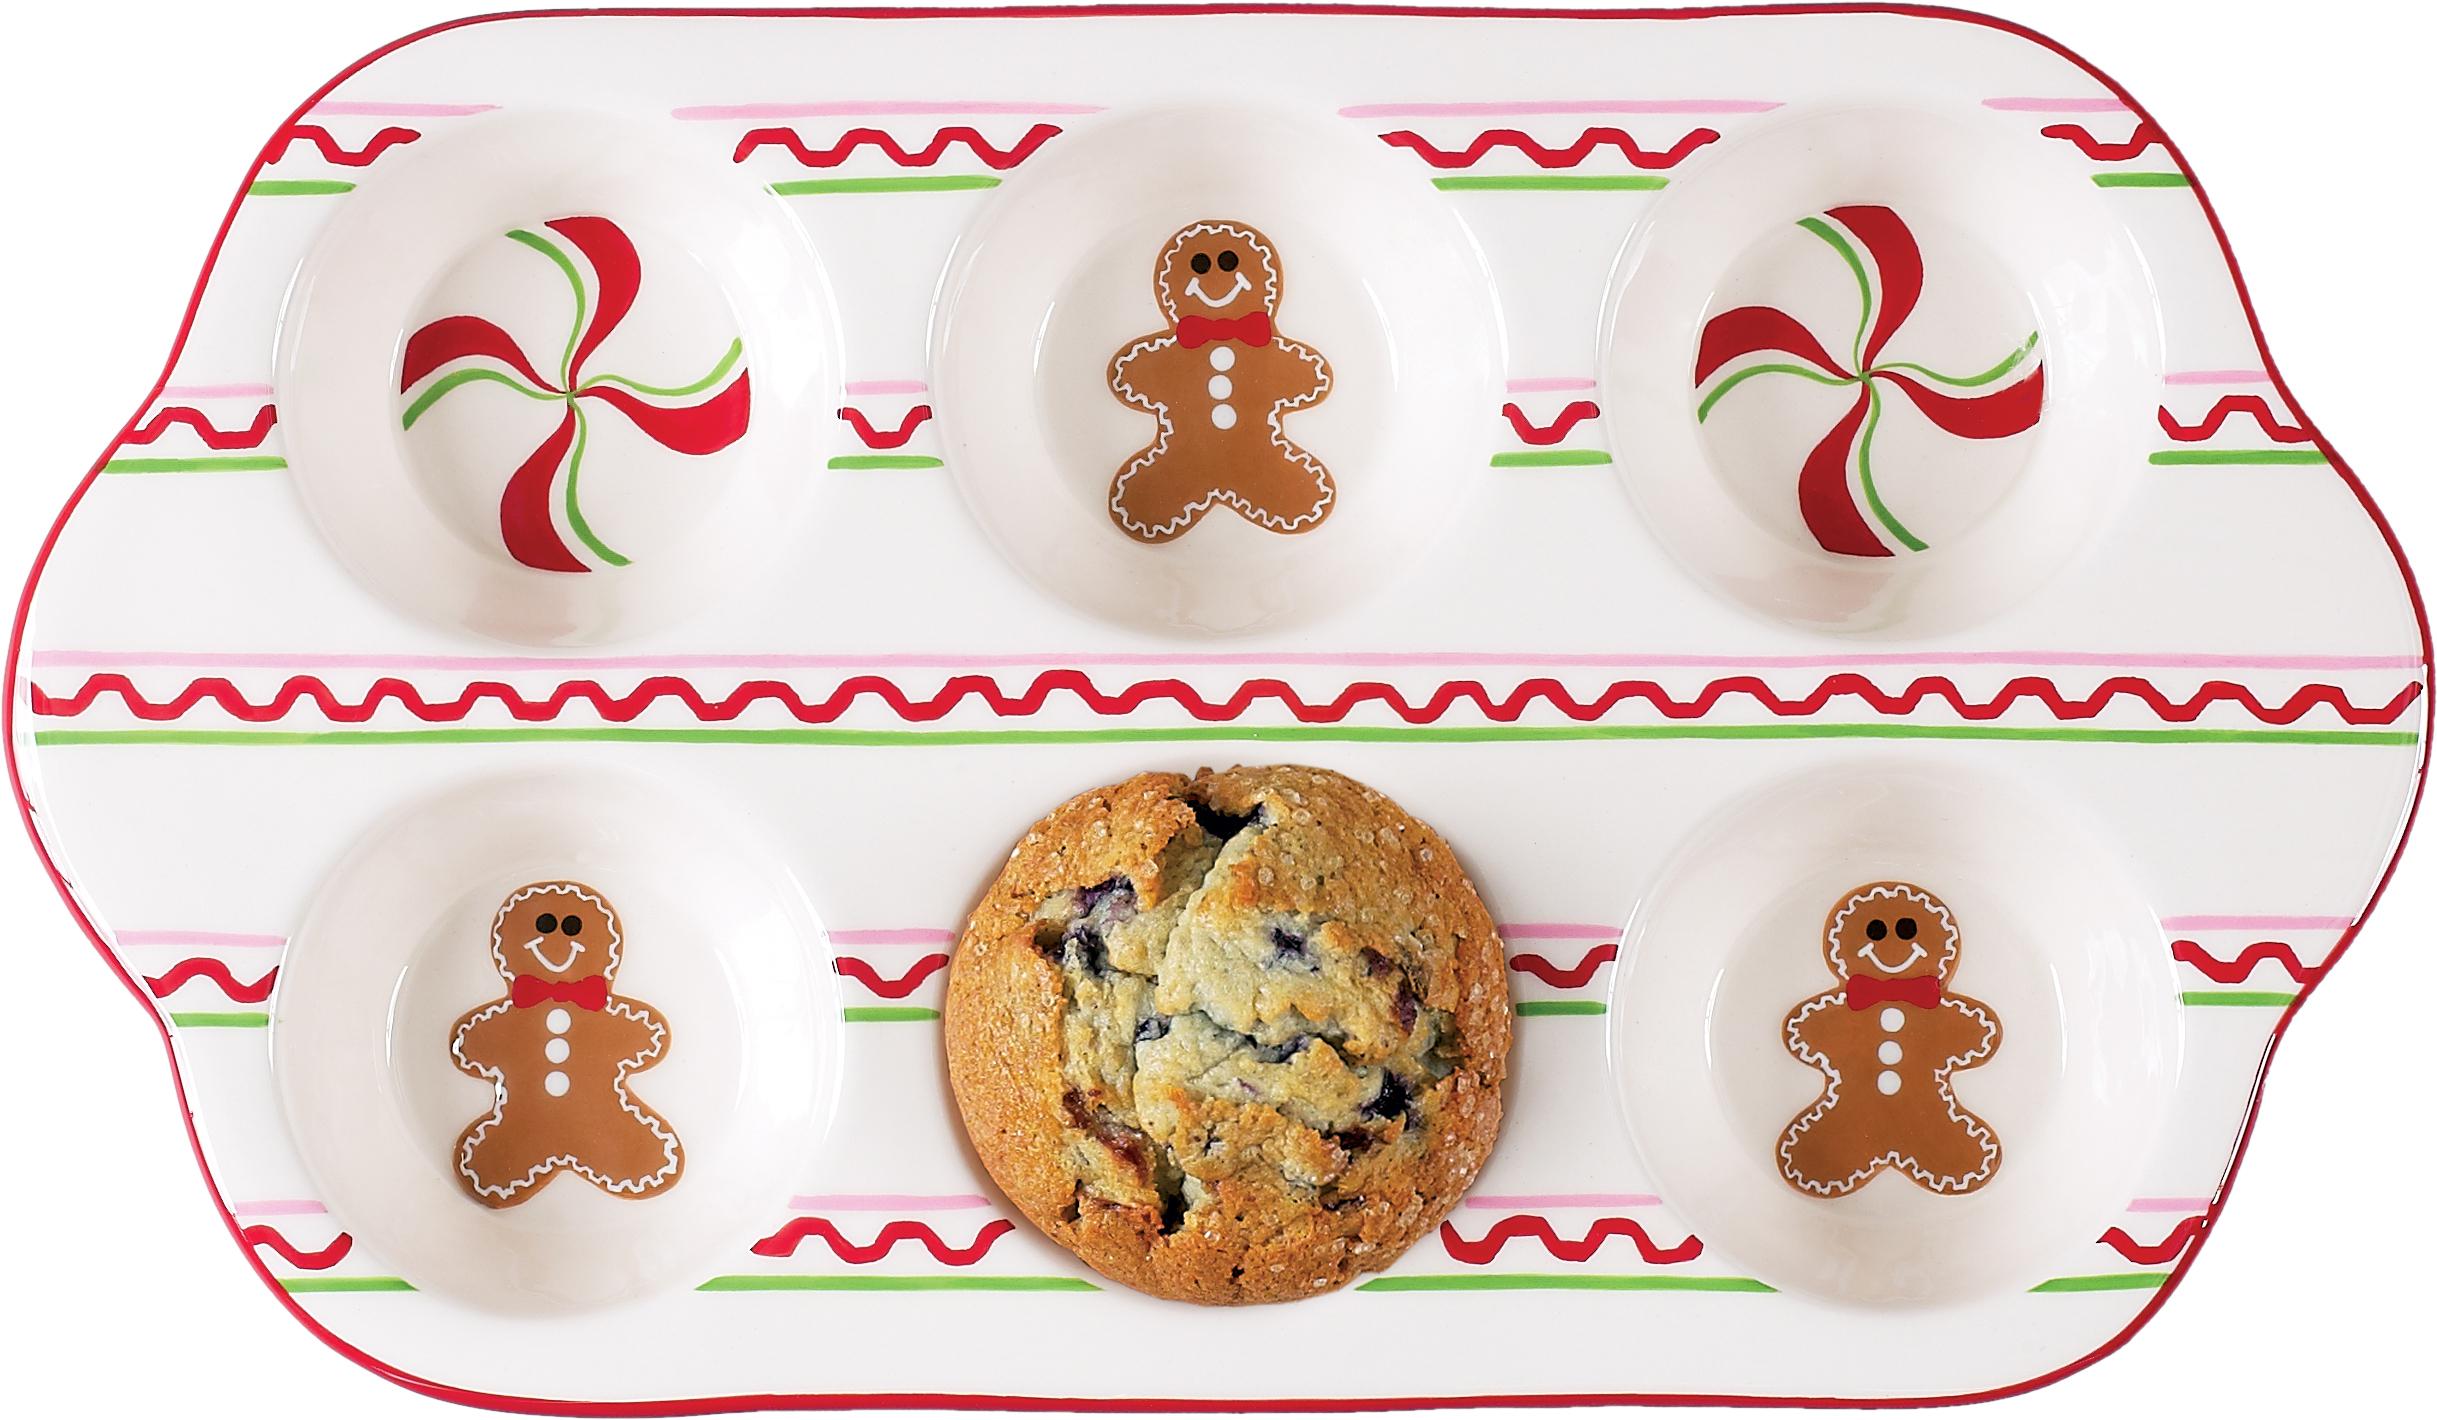 Boston Warehouse Sugar and Spice 6 Cup Muffin Baking Pan